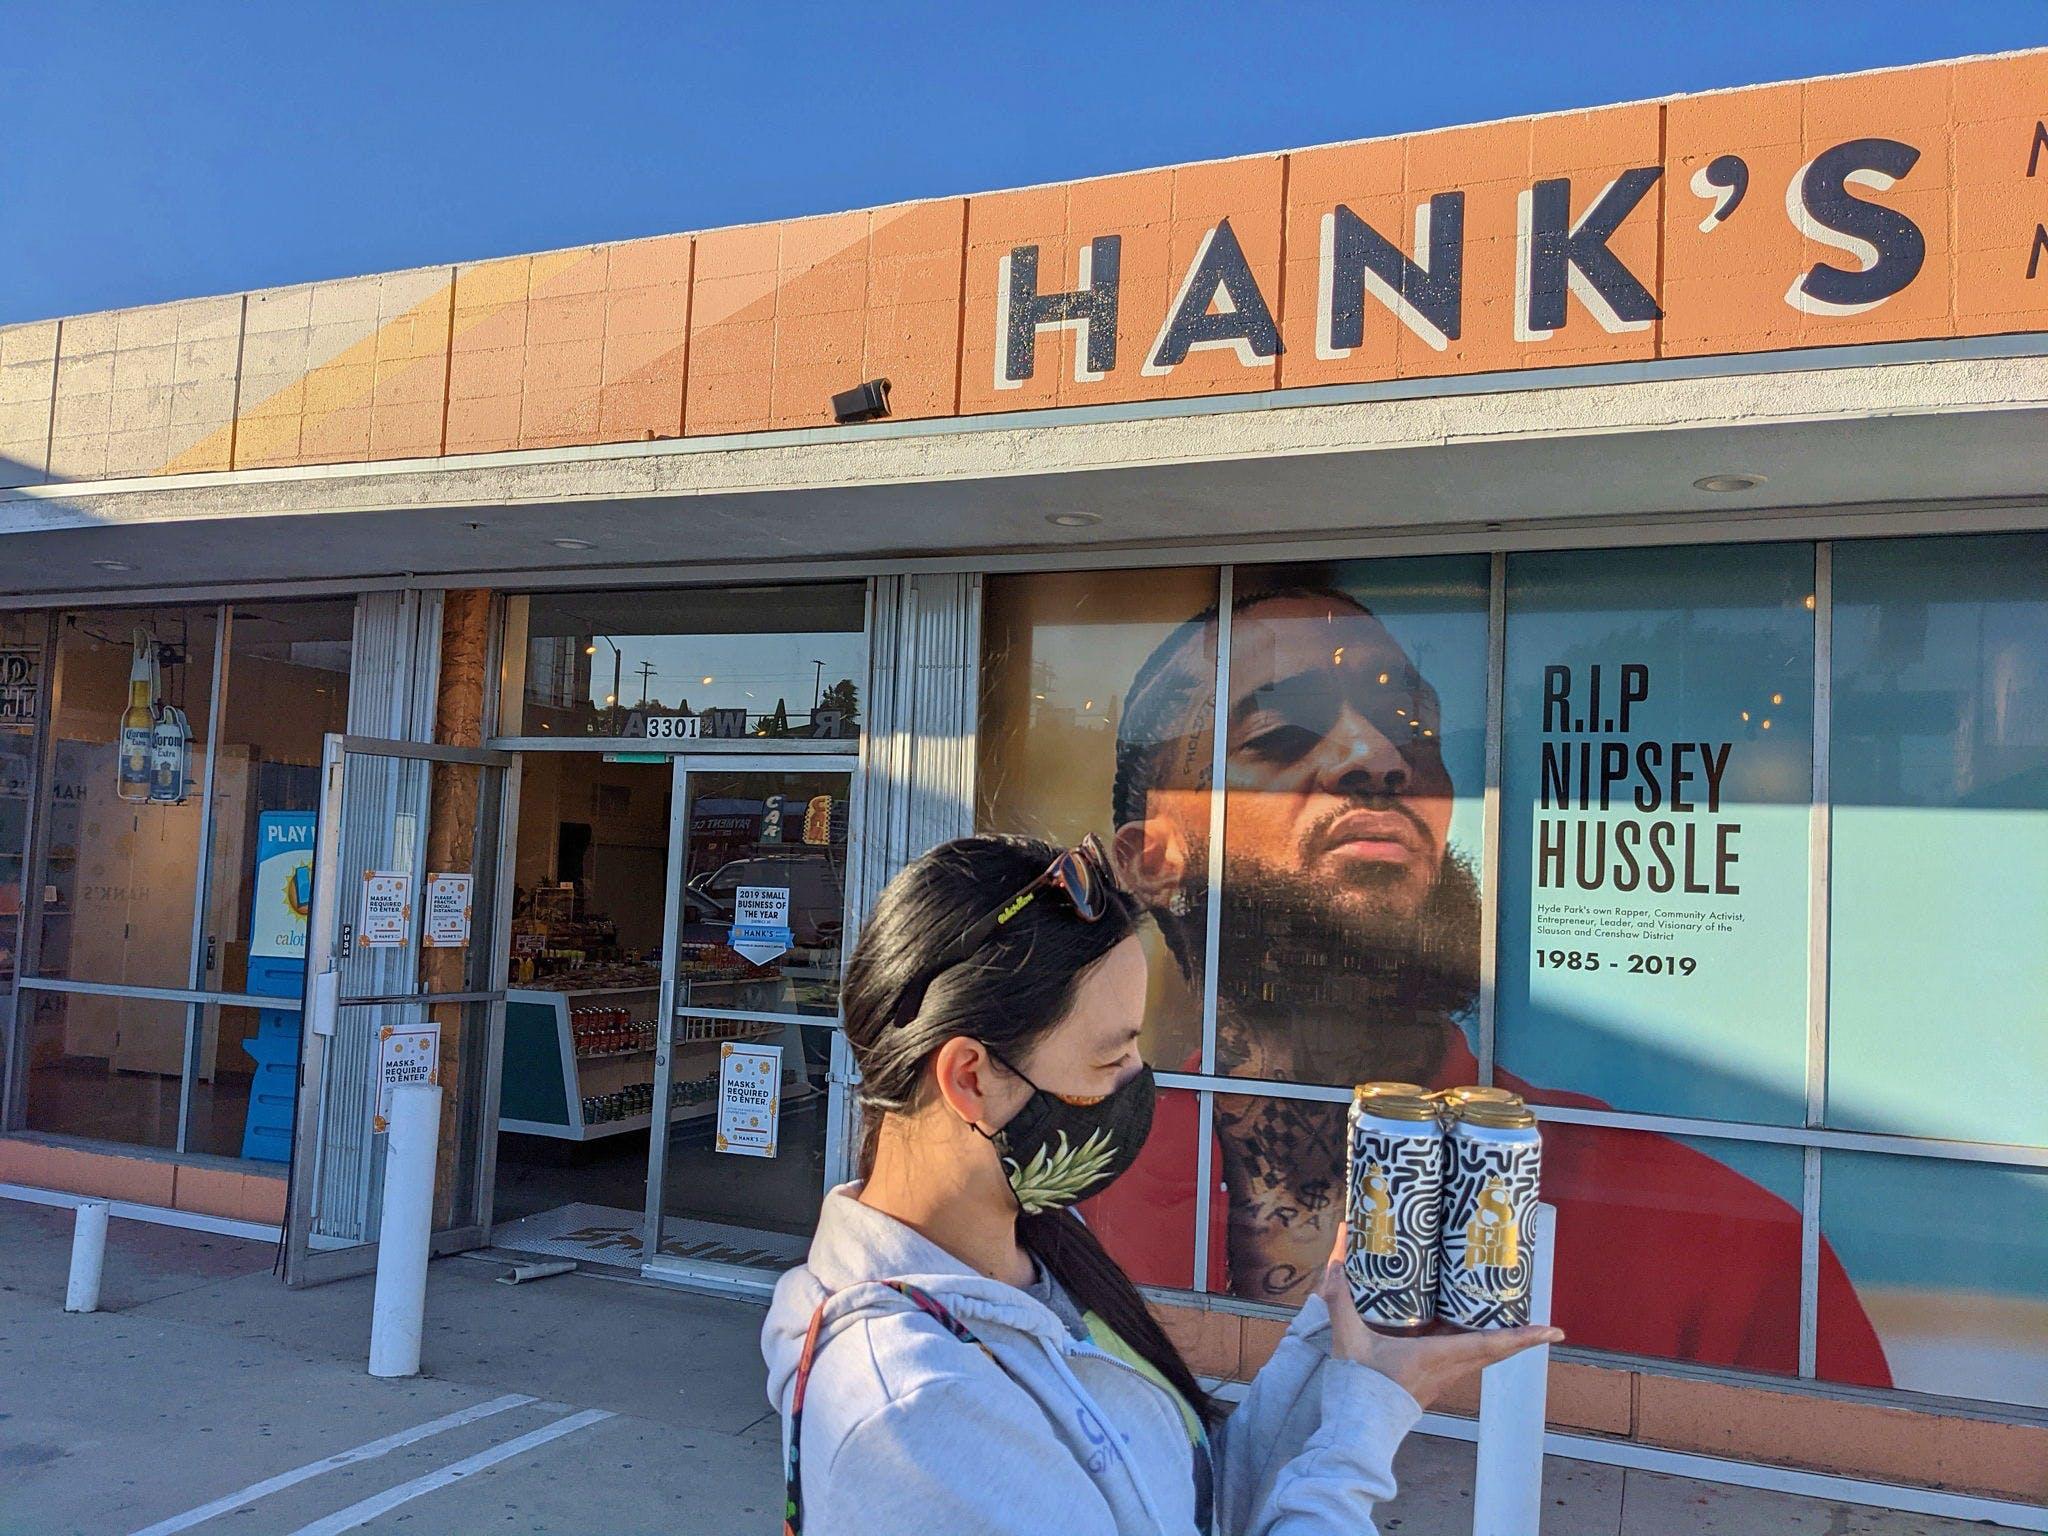 Woman standing in front of Hank